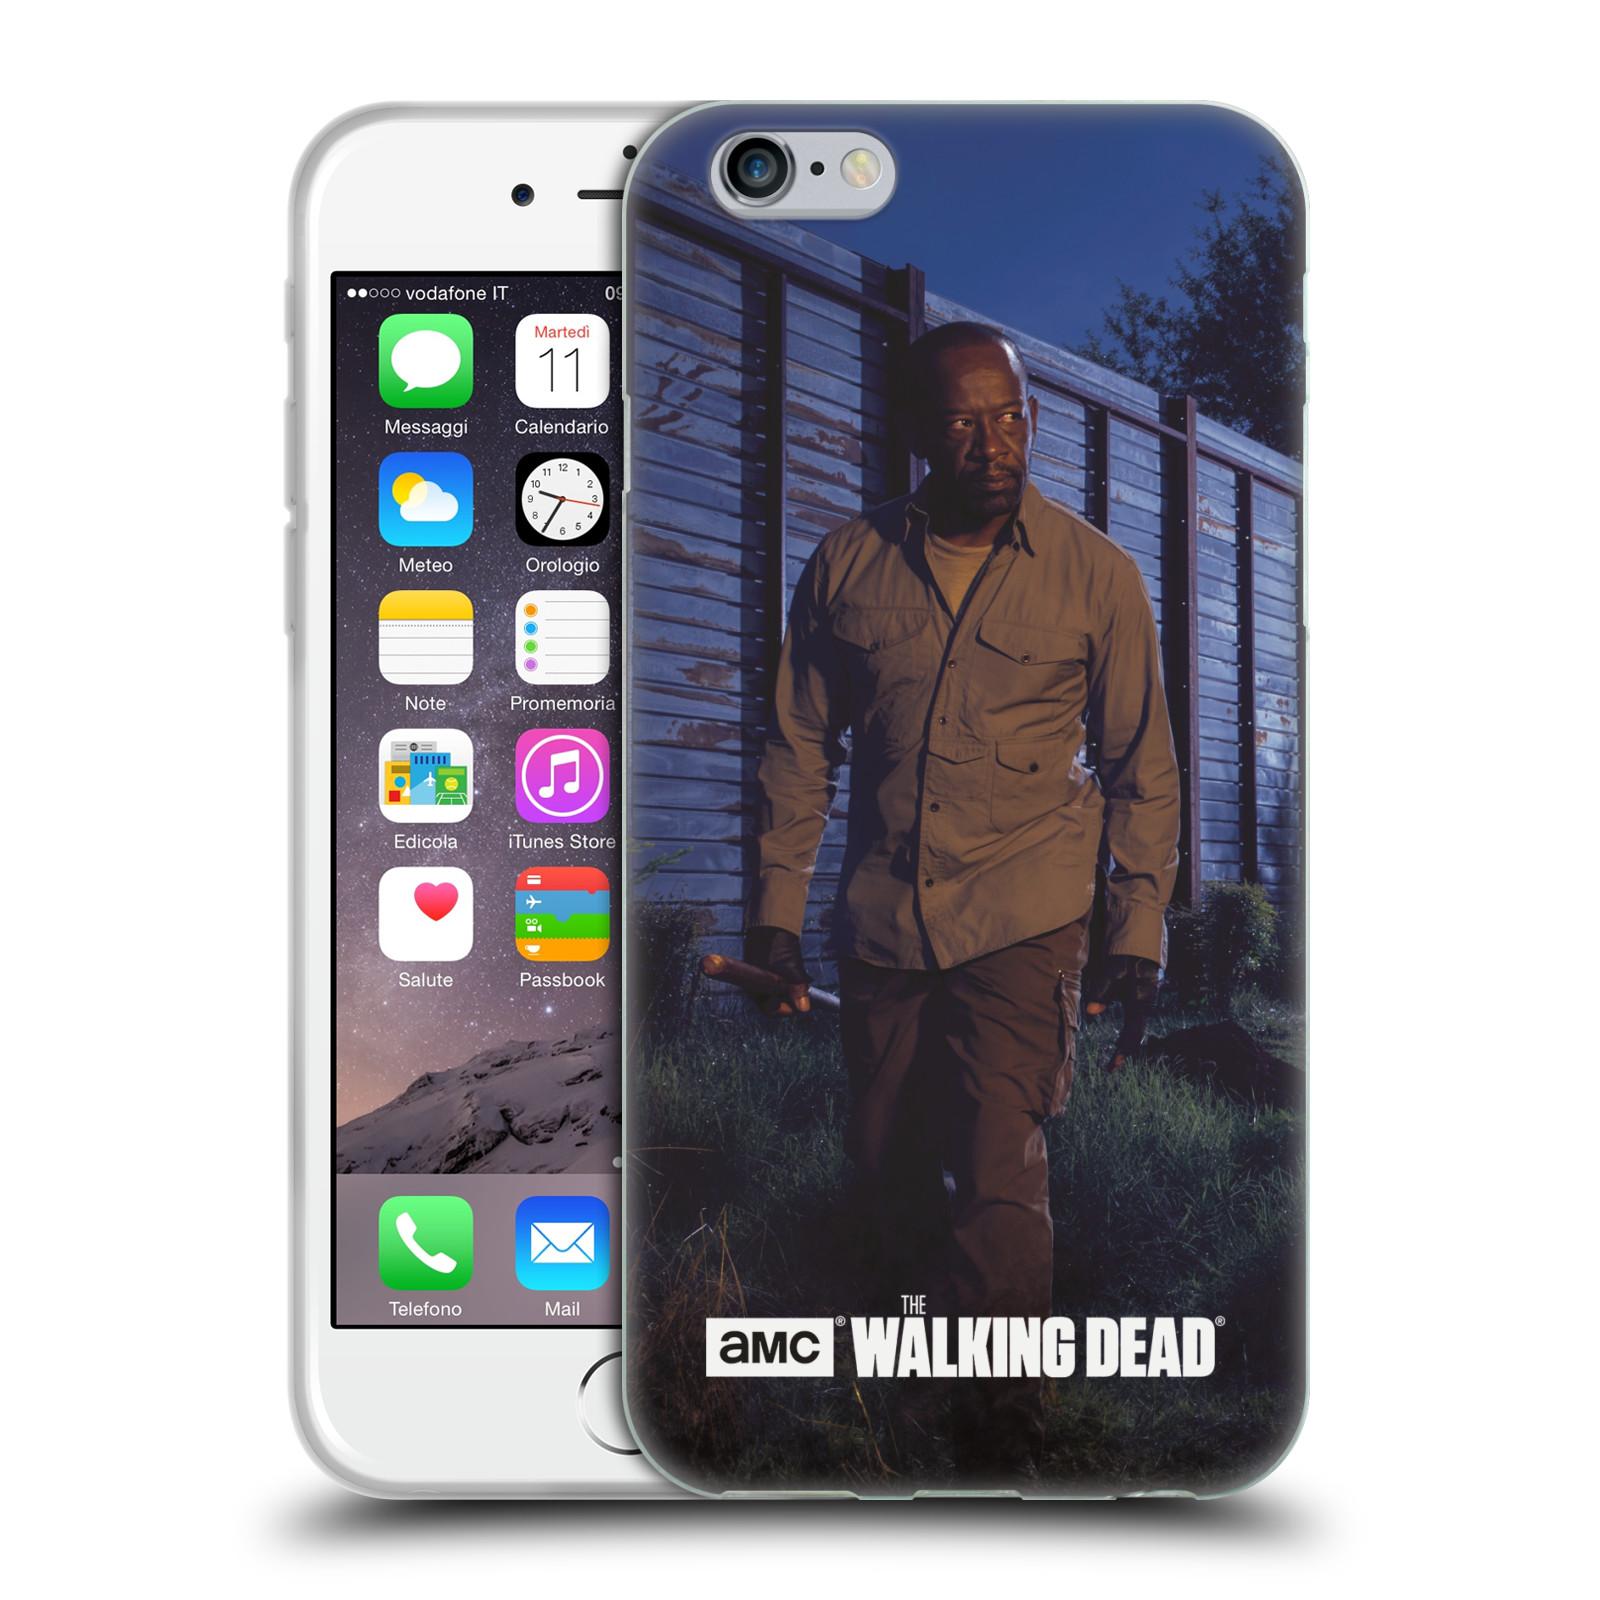 HEAD CASE silikonový obal na mobil Apple Iphone 6 / 6S originální potisk Walking Dead postavy v akci Morgan